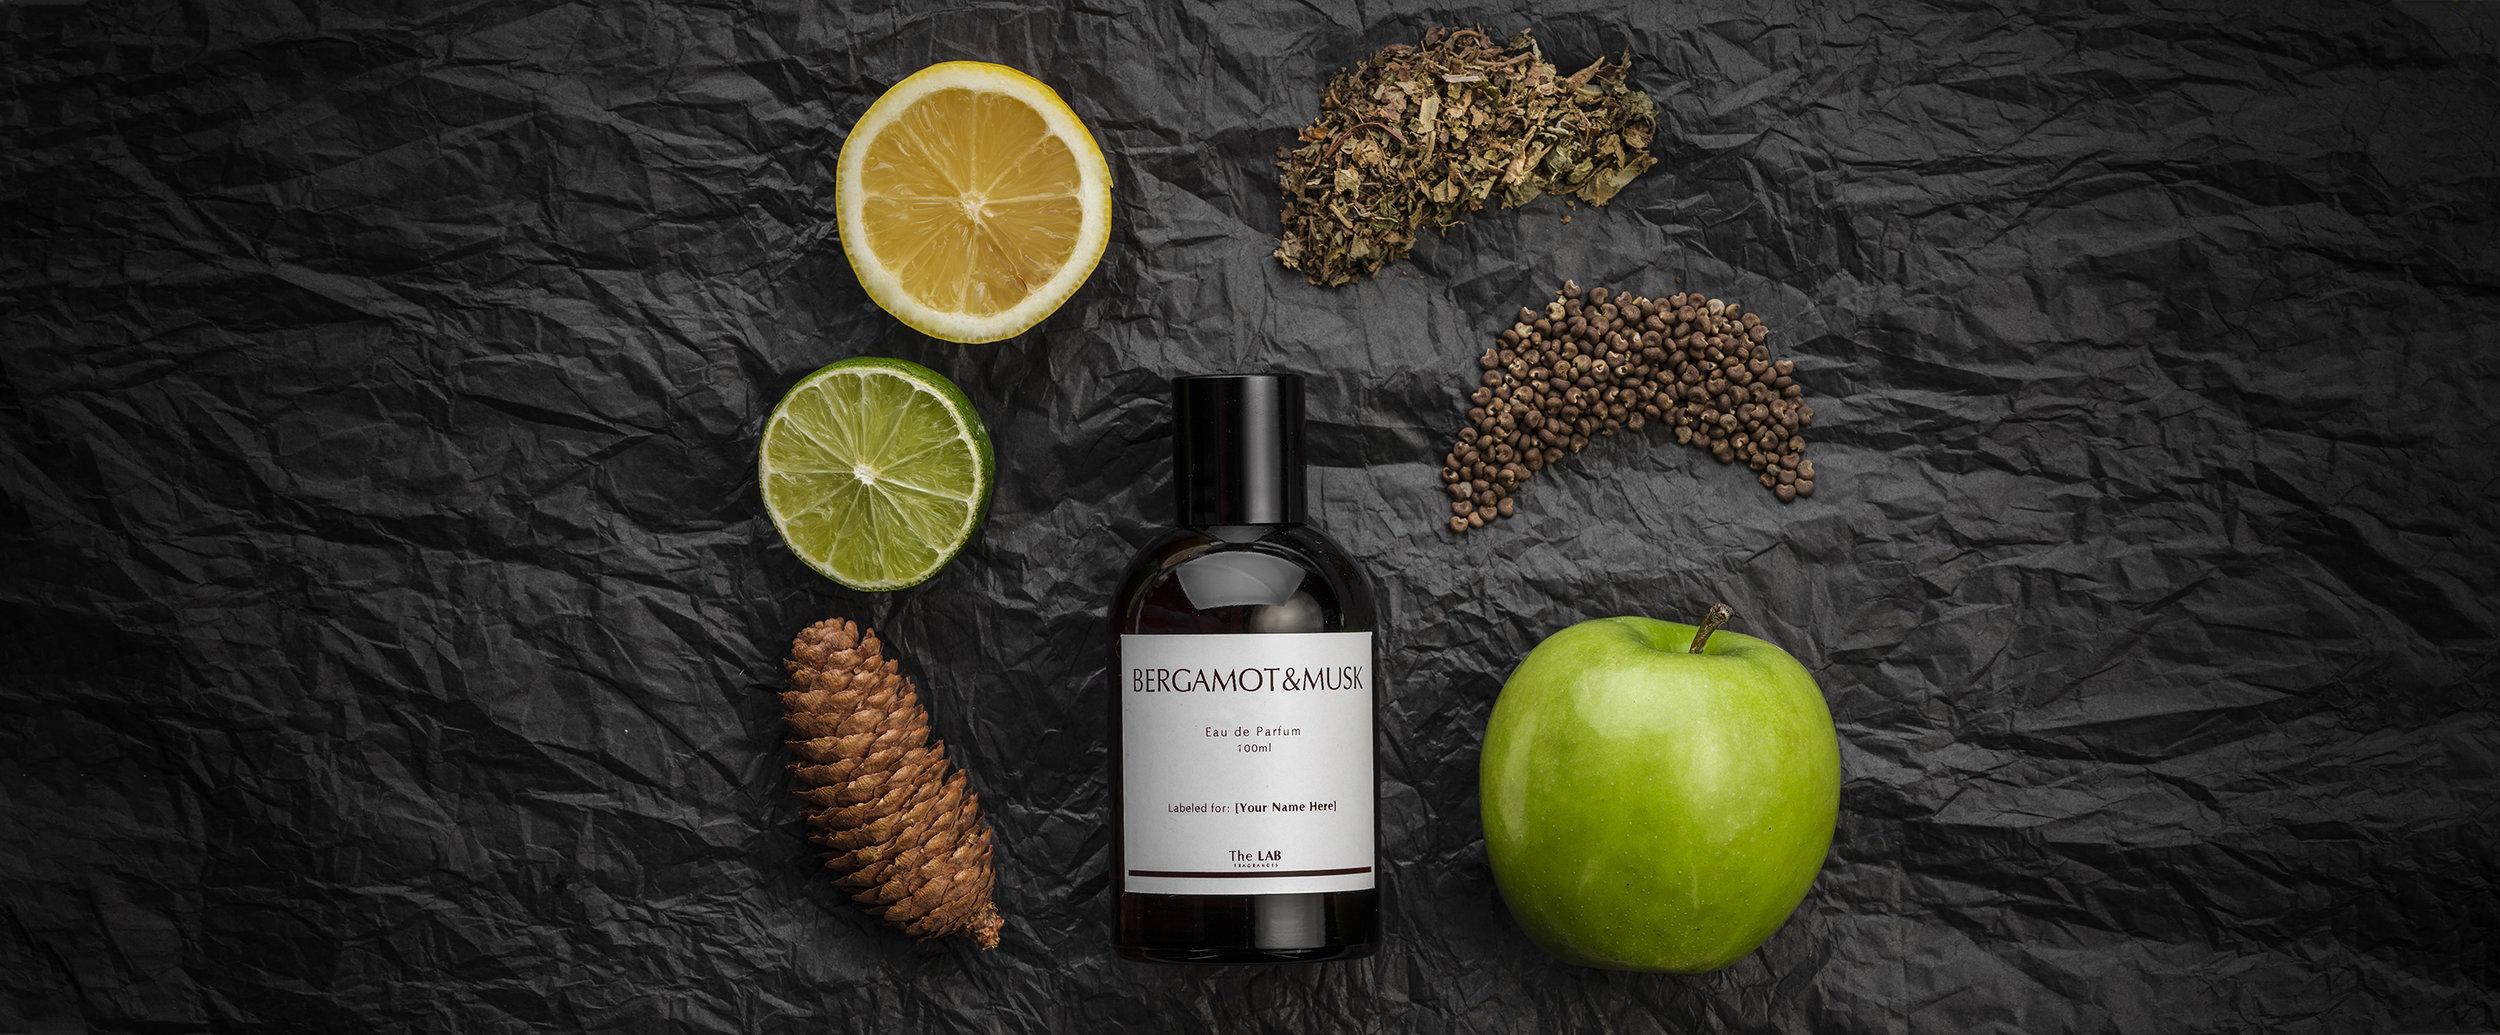 Bergamot&Musk Perfume Ingredients Composition.jpg